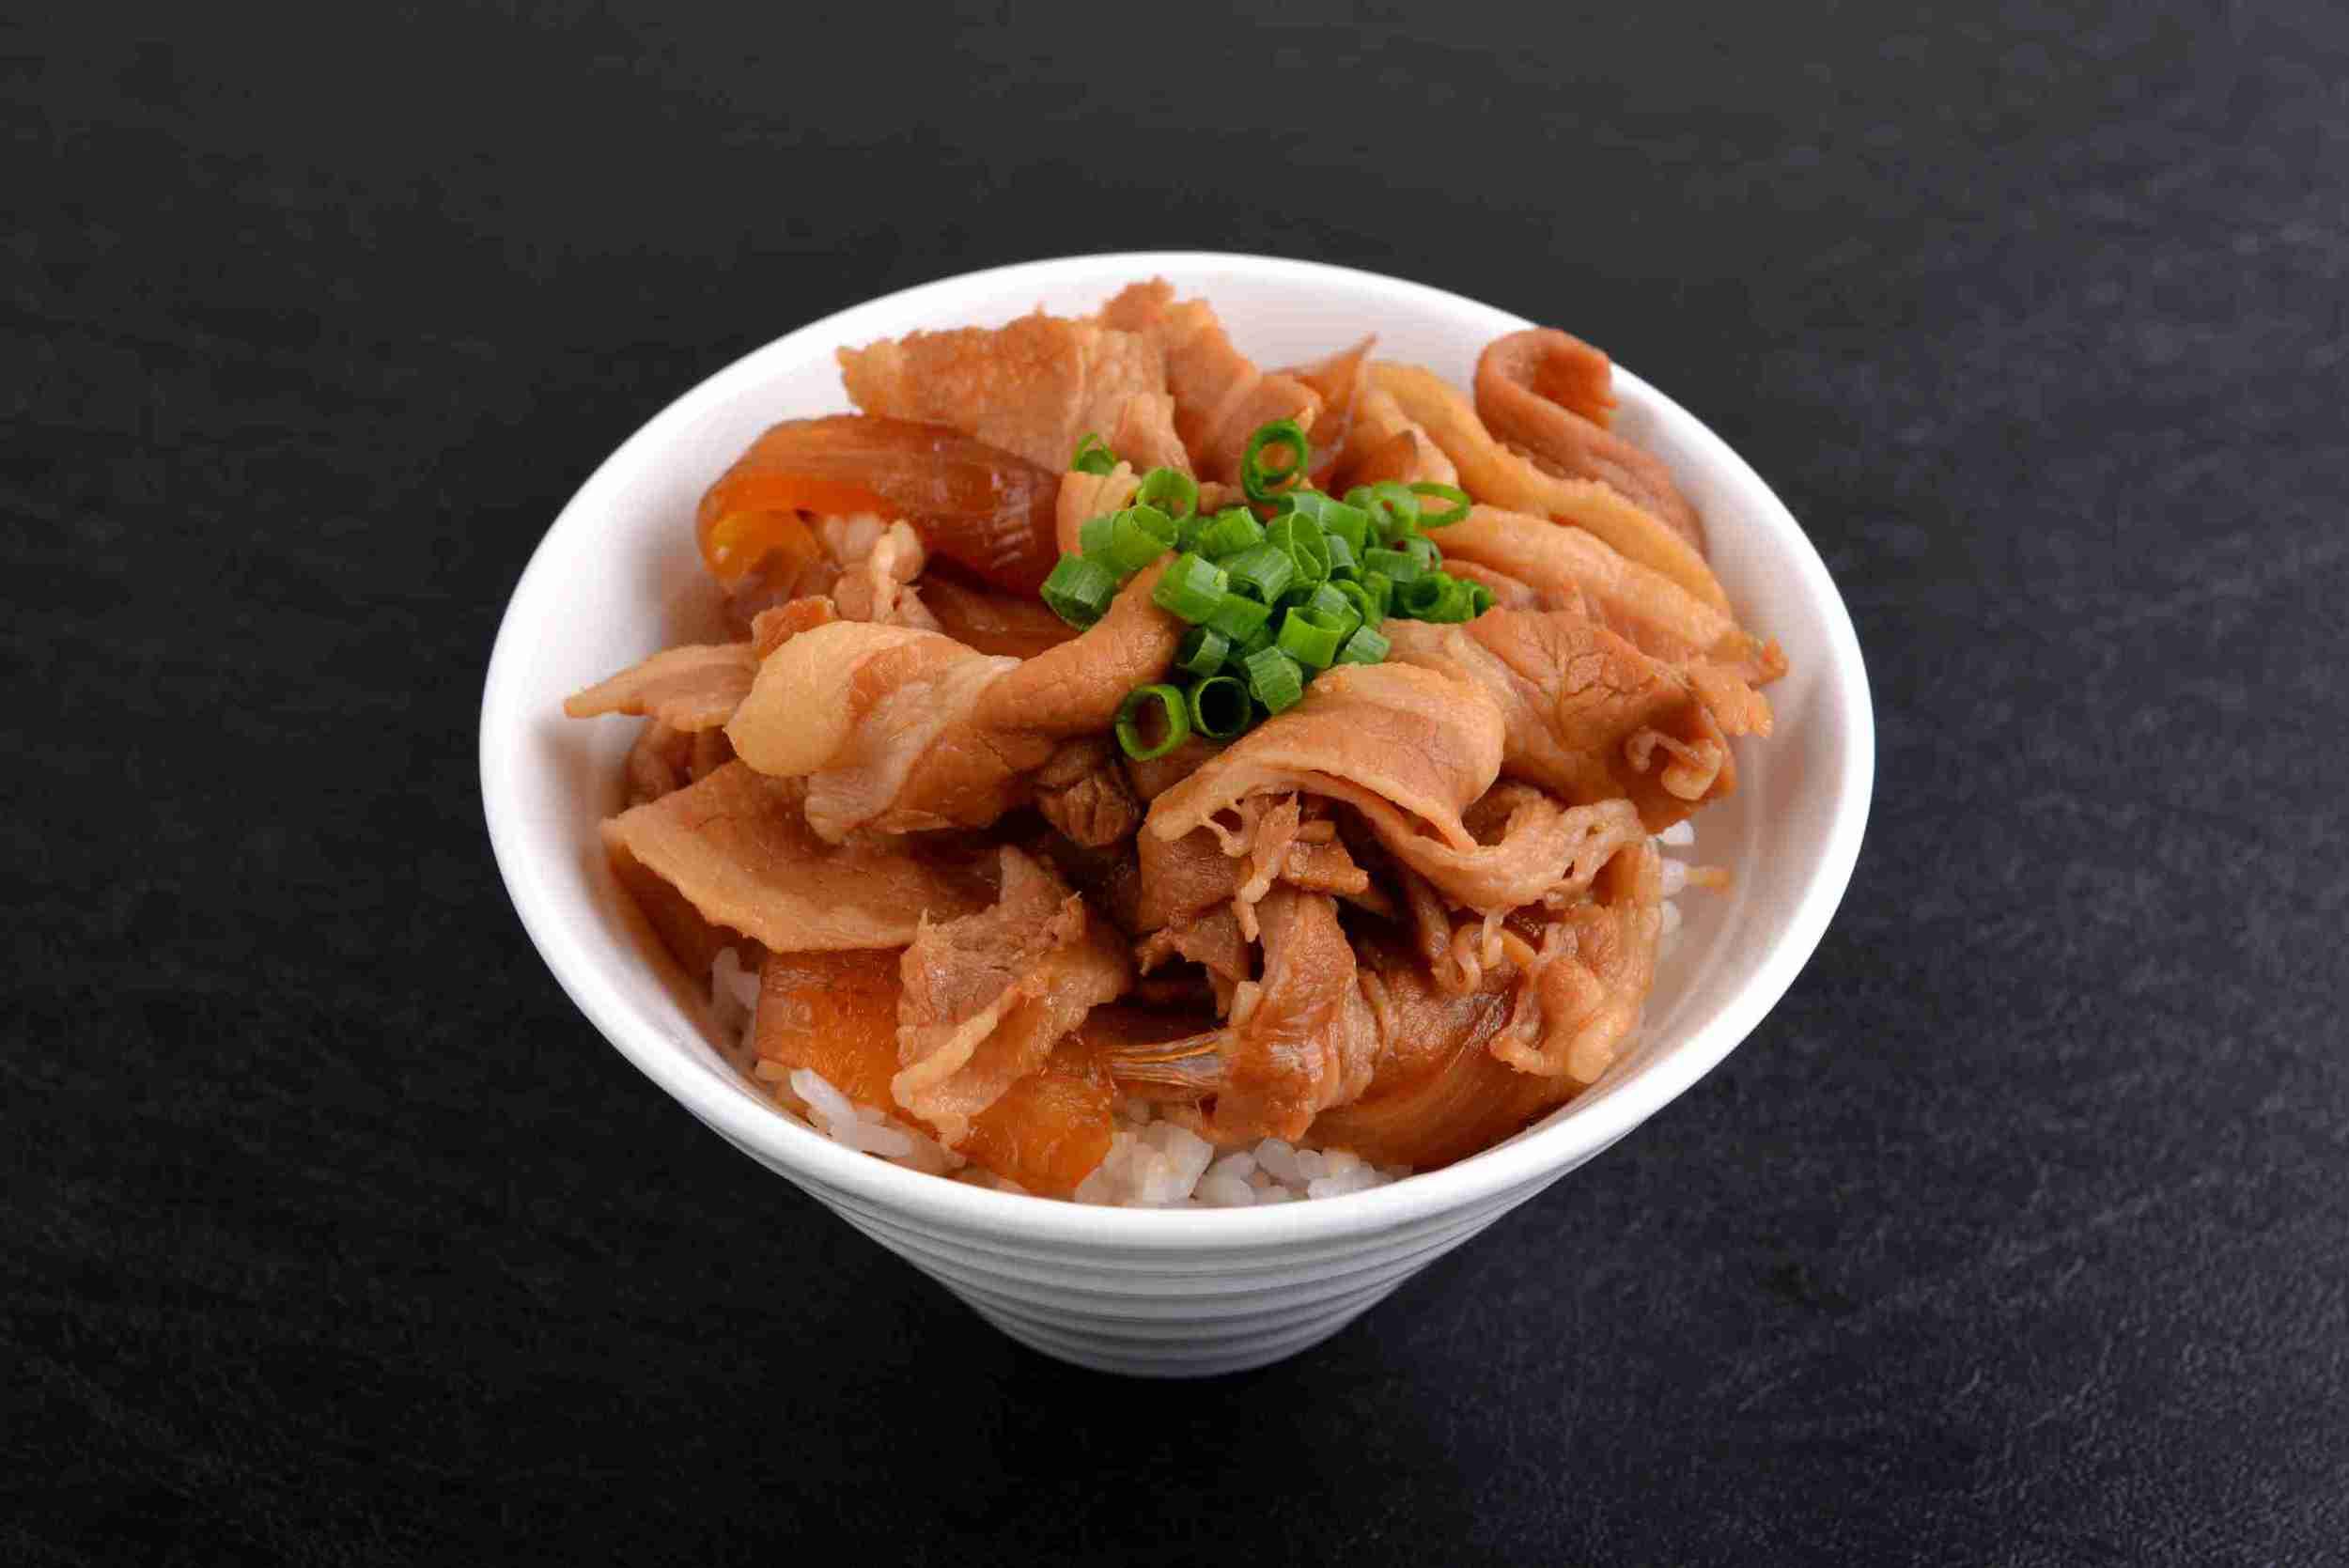 BUTA MESHI (Pork SUKIYAKI on Rice) ($6.50)